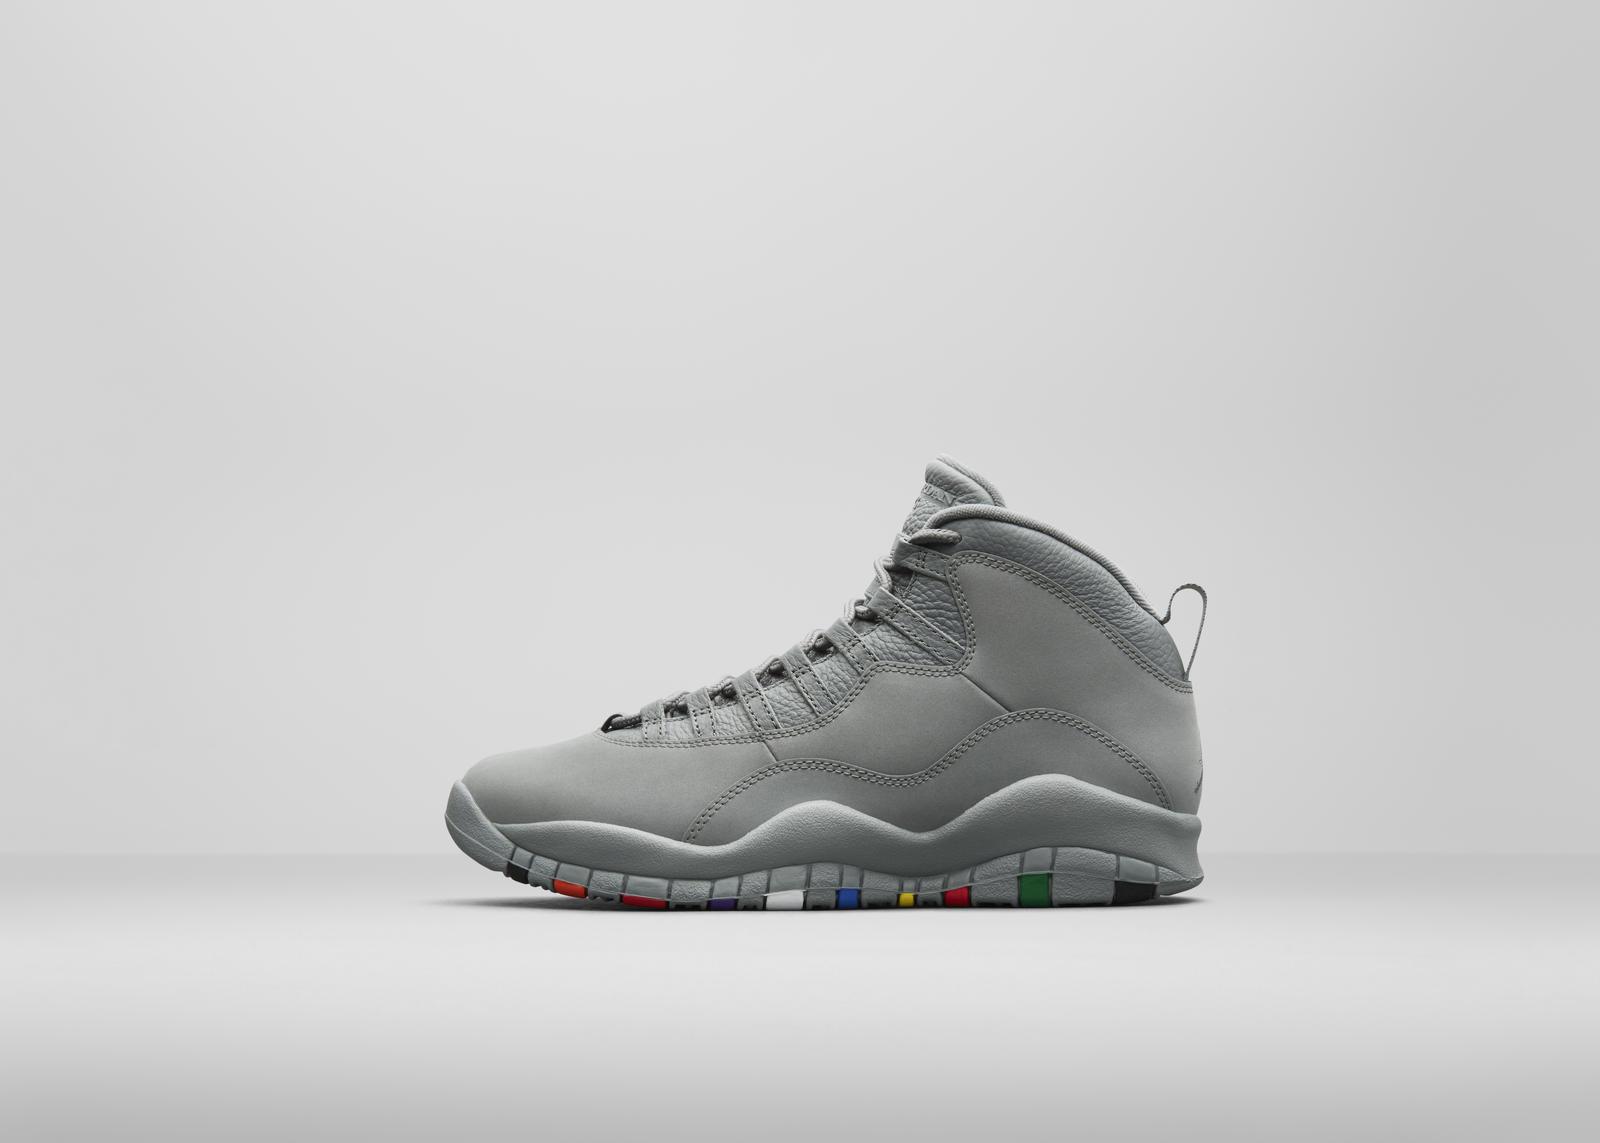 info for 2411e 793c3 low price air jordan 4 retro dark grey kit 37655 e06b0